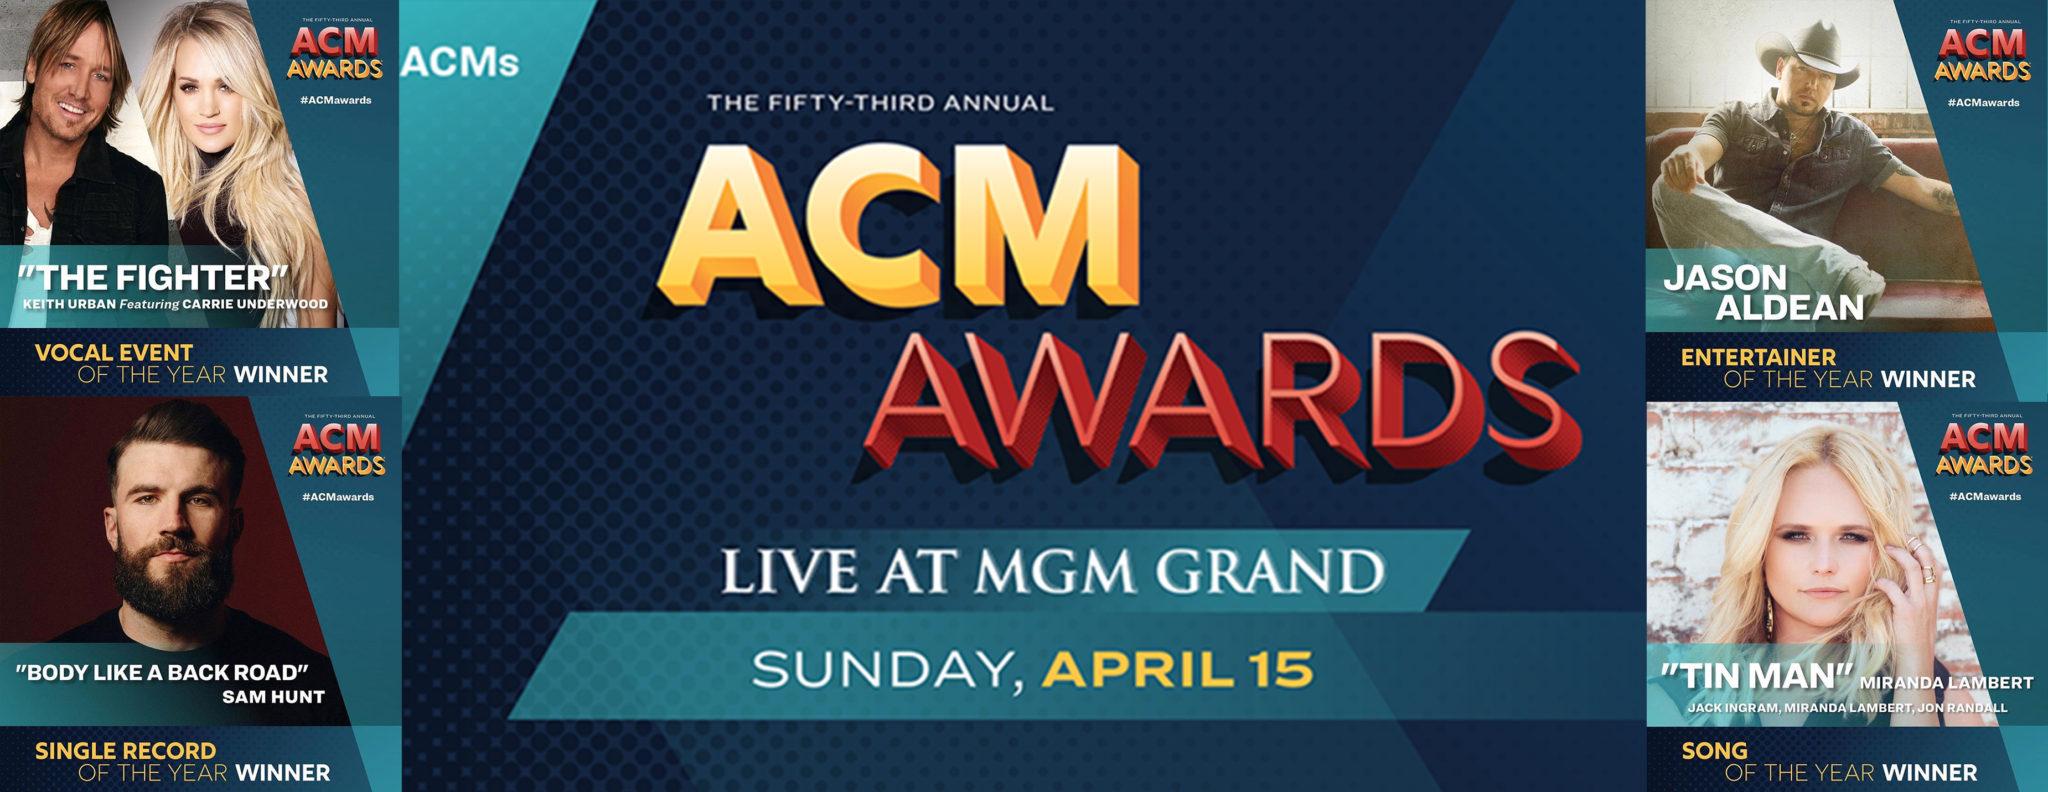 2018 ACM Award Show Winners